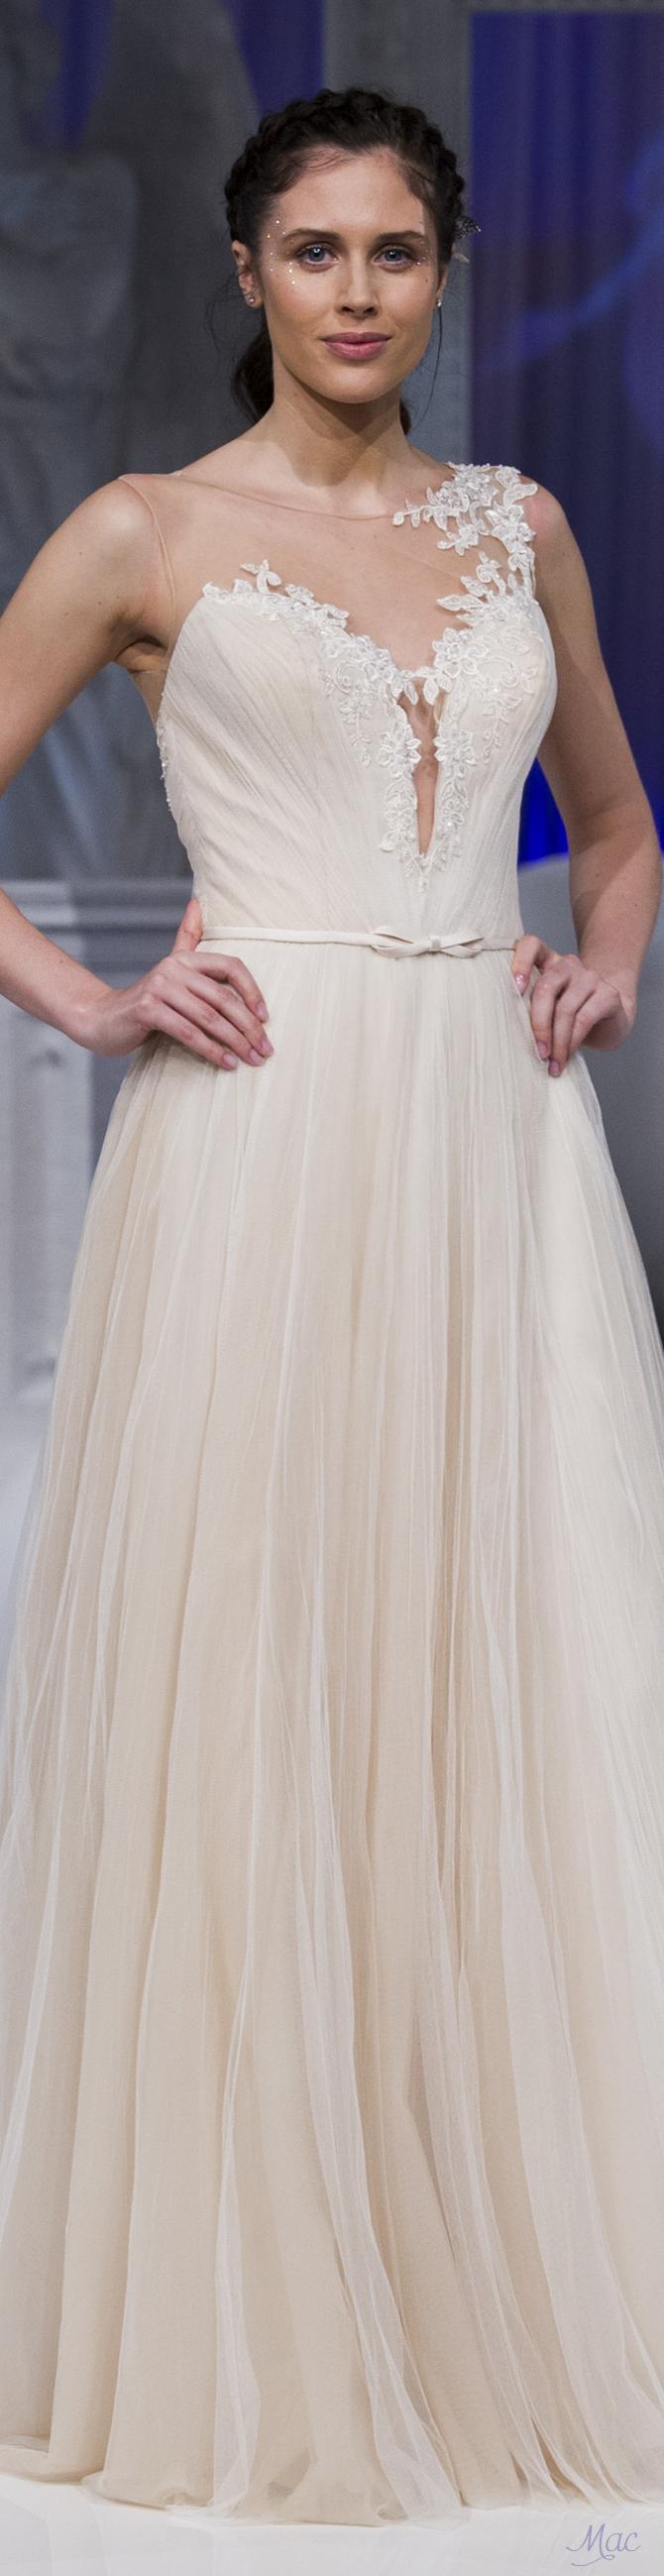 Spring bridal nicole nicole bridal couture pinterest